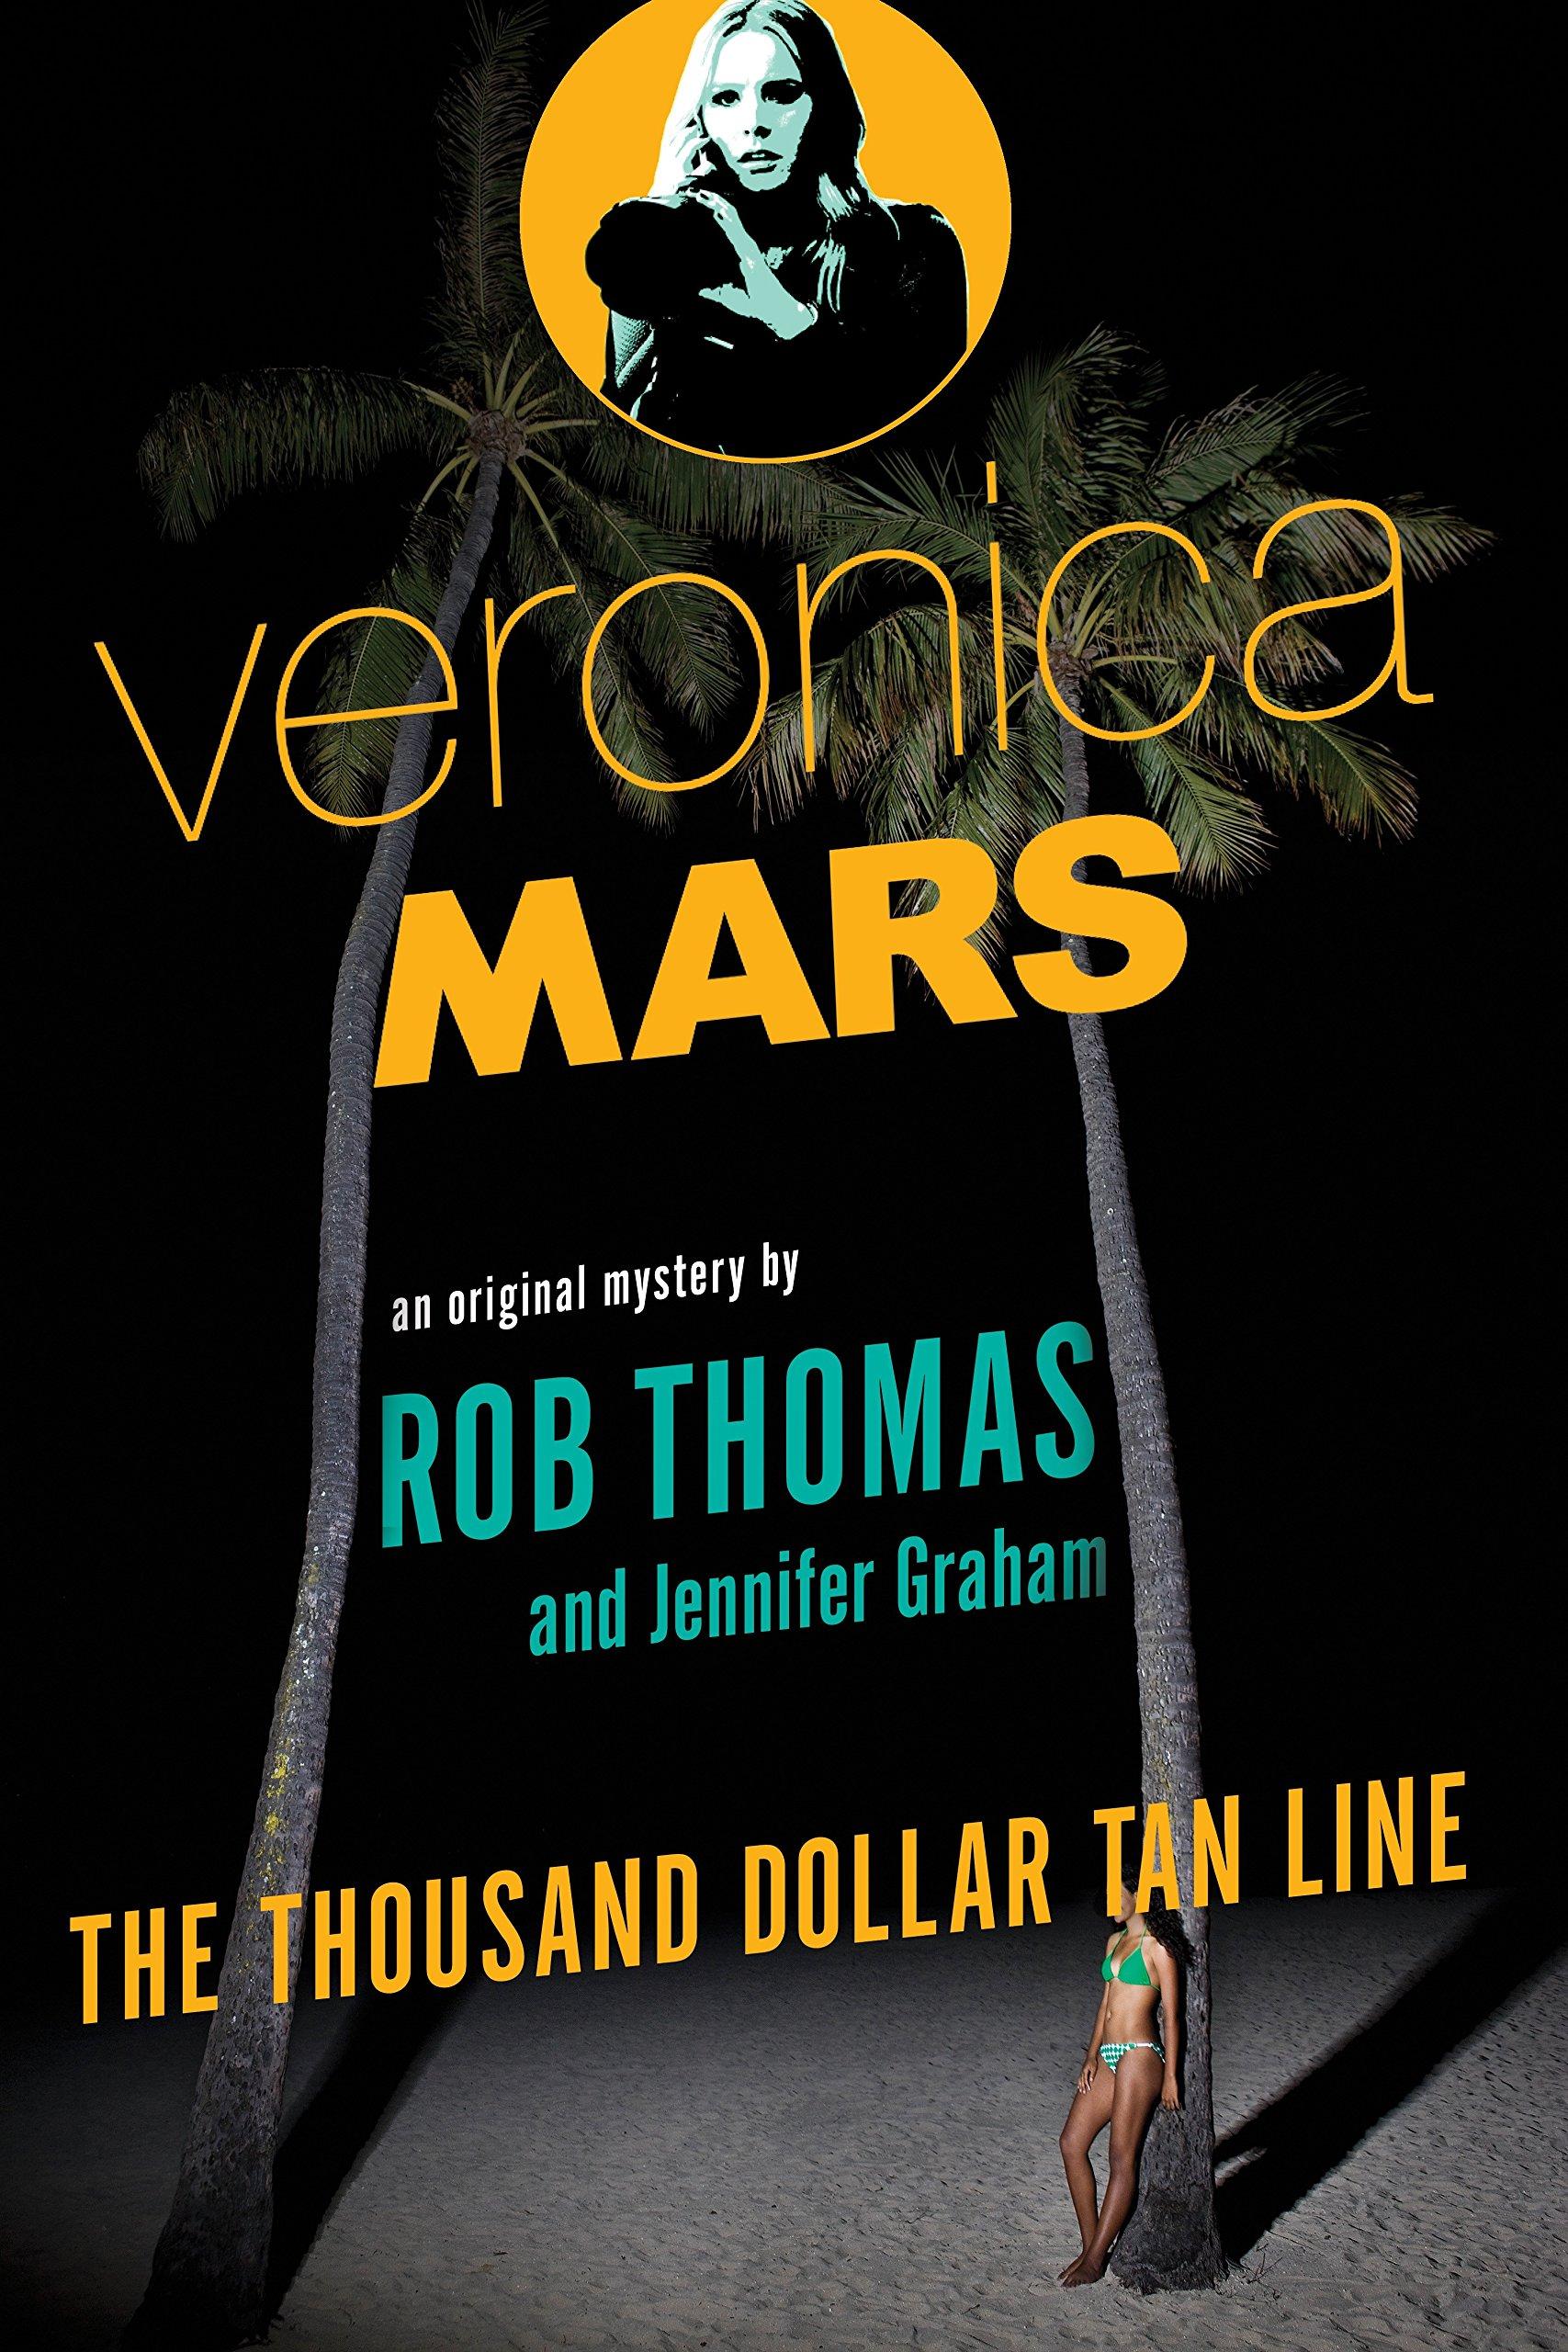 The Thousand Dollar Tan Line Veronica Mars 1 By Rob Thomas